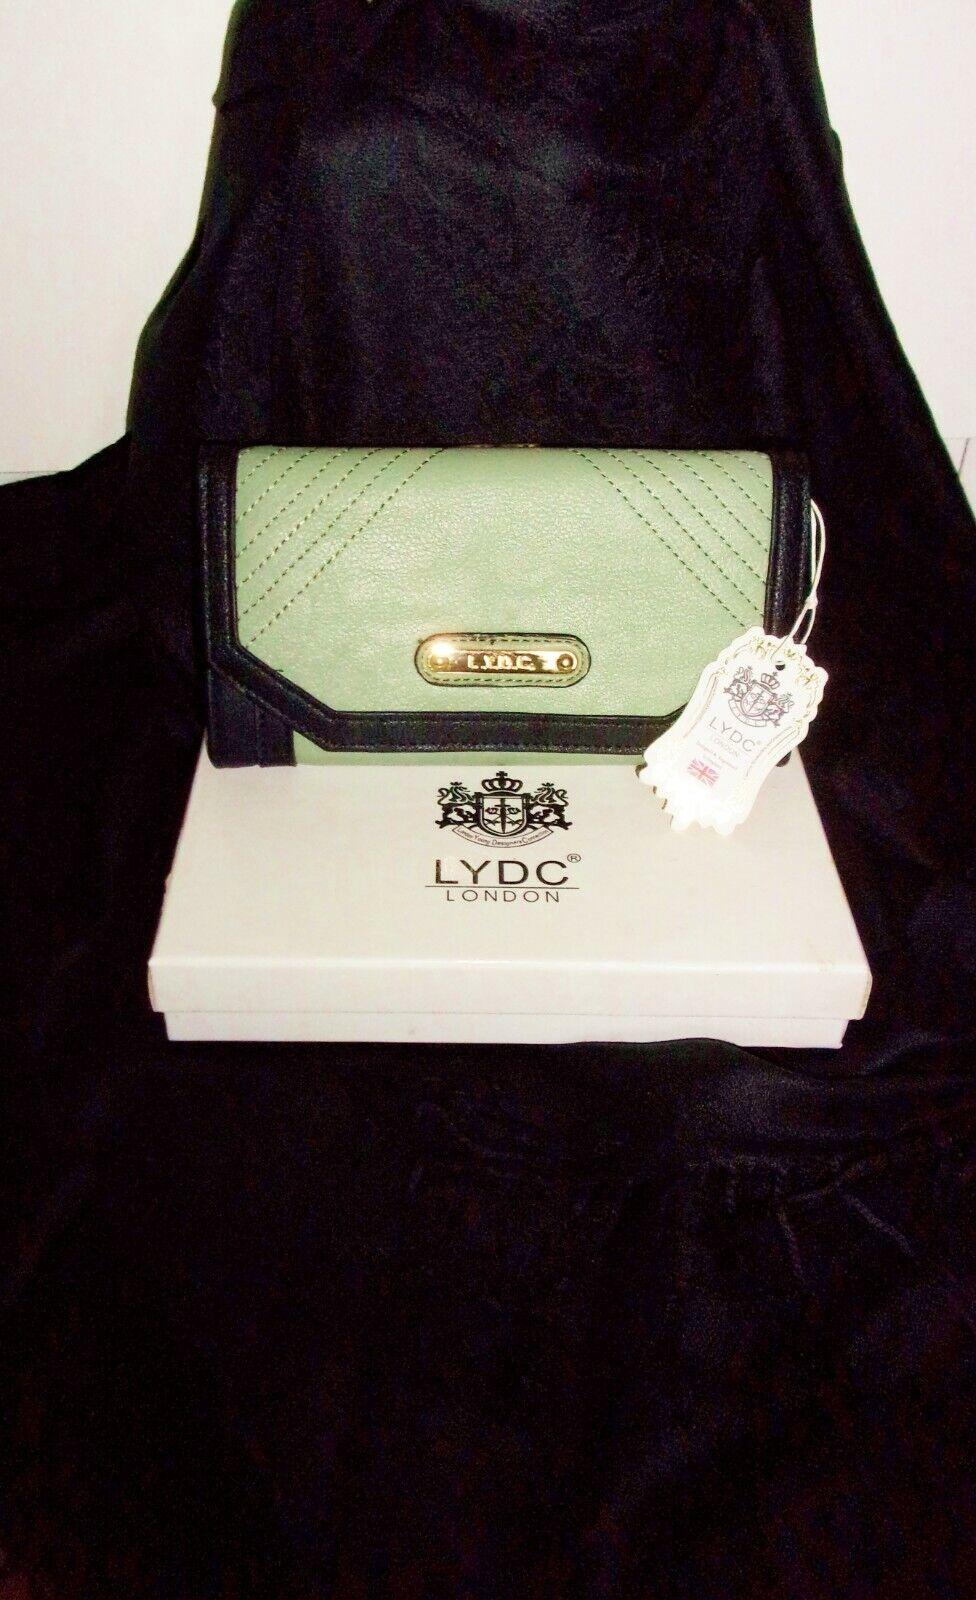 LYDC Designer Purse with Gift Box & Black Pashmina Scarf - Gift Idea